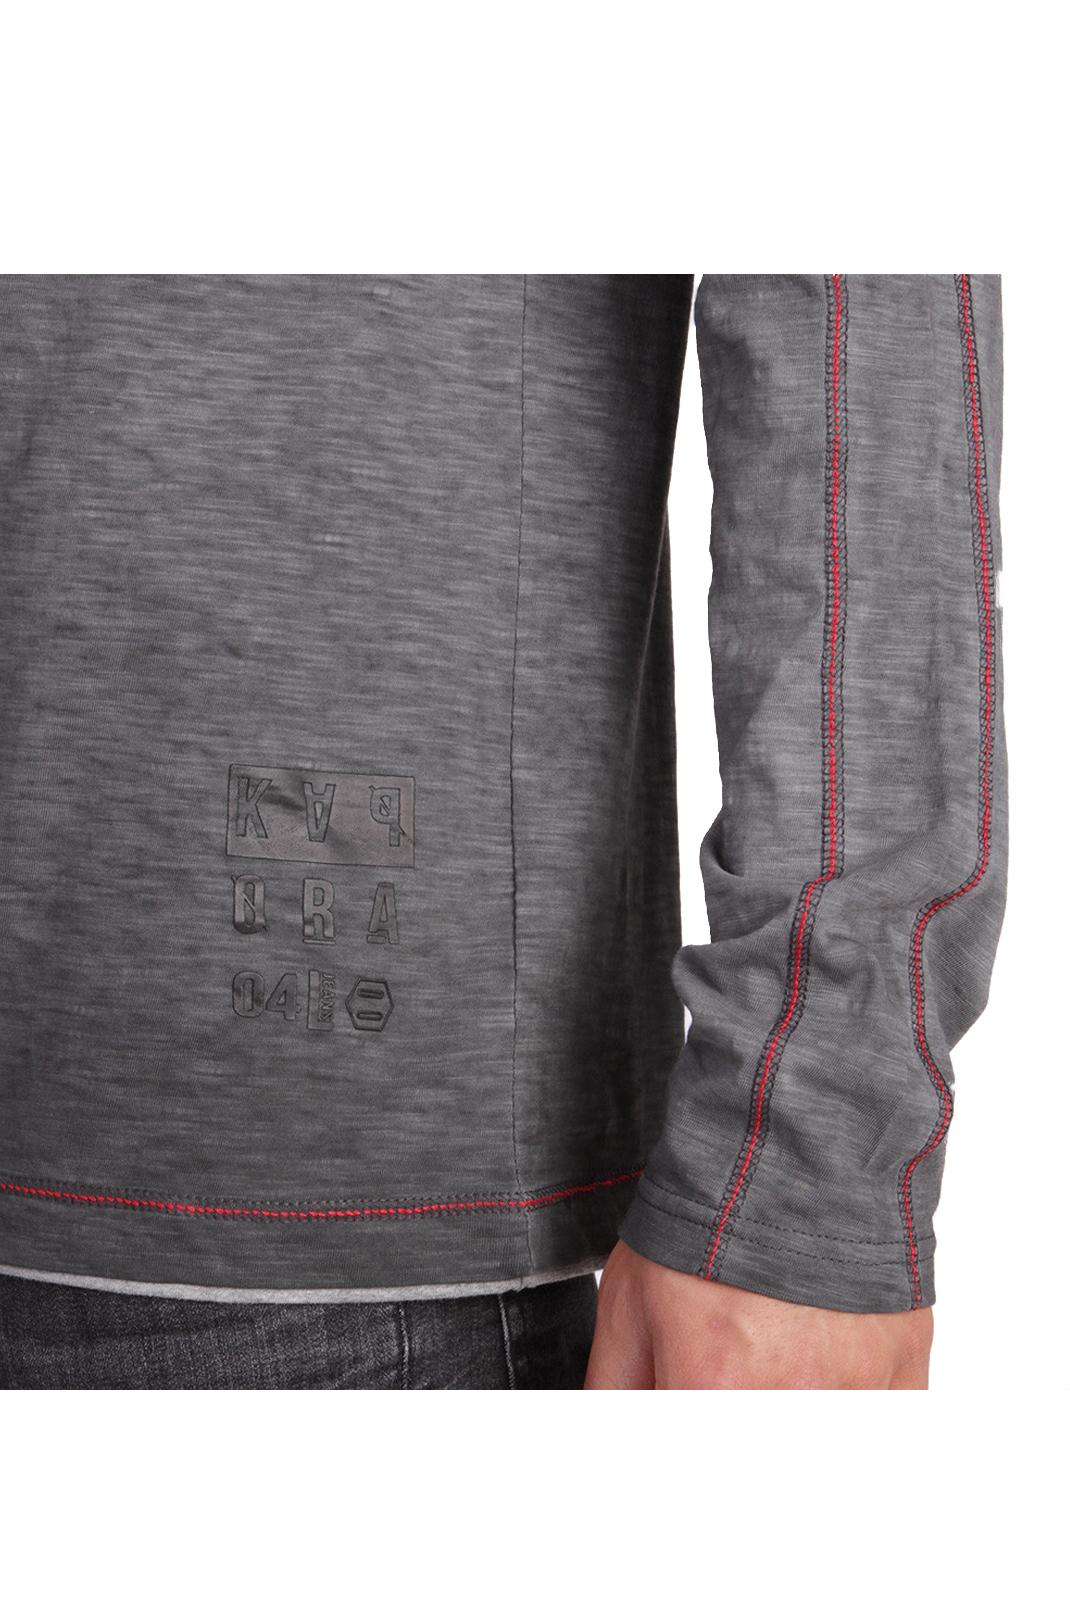 Tee-shirts  Kaporal GODAL BLACK